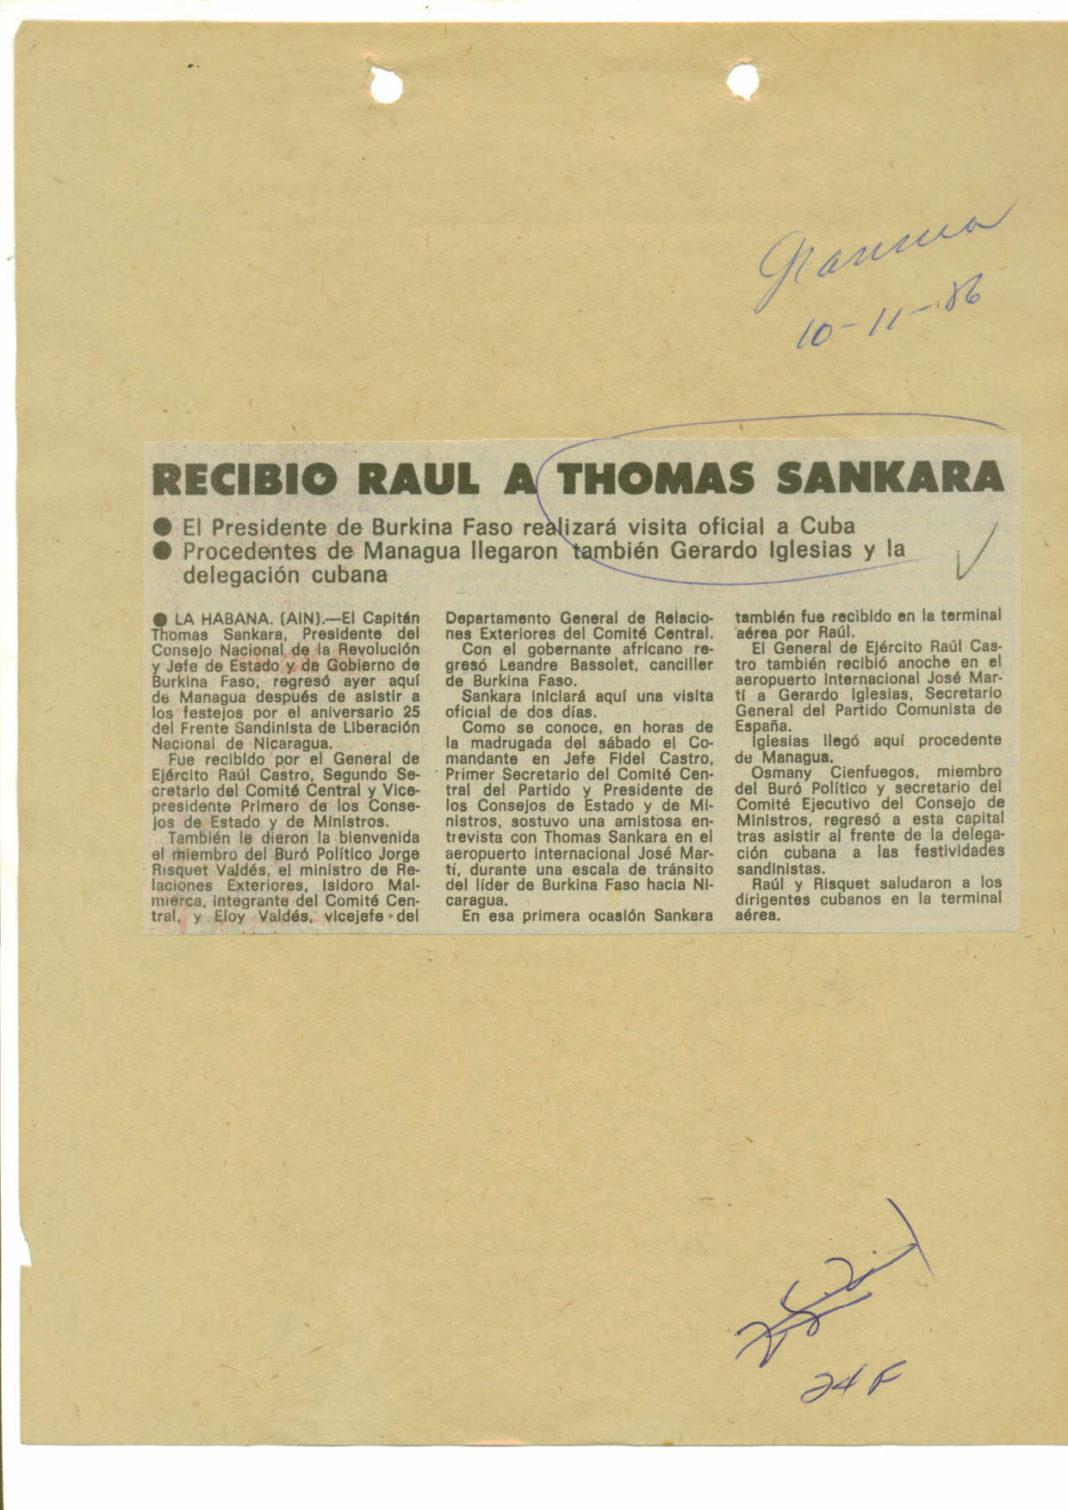 granma_10-11-86-2.jpg